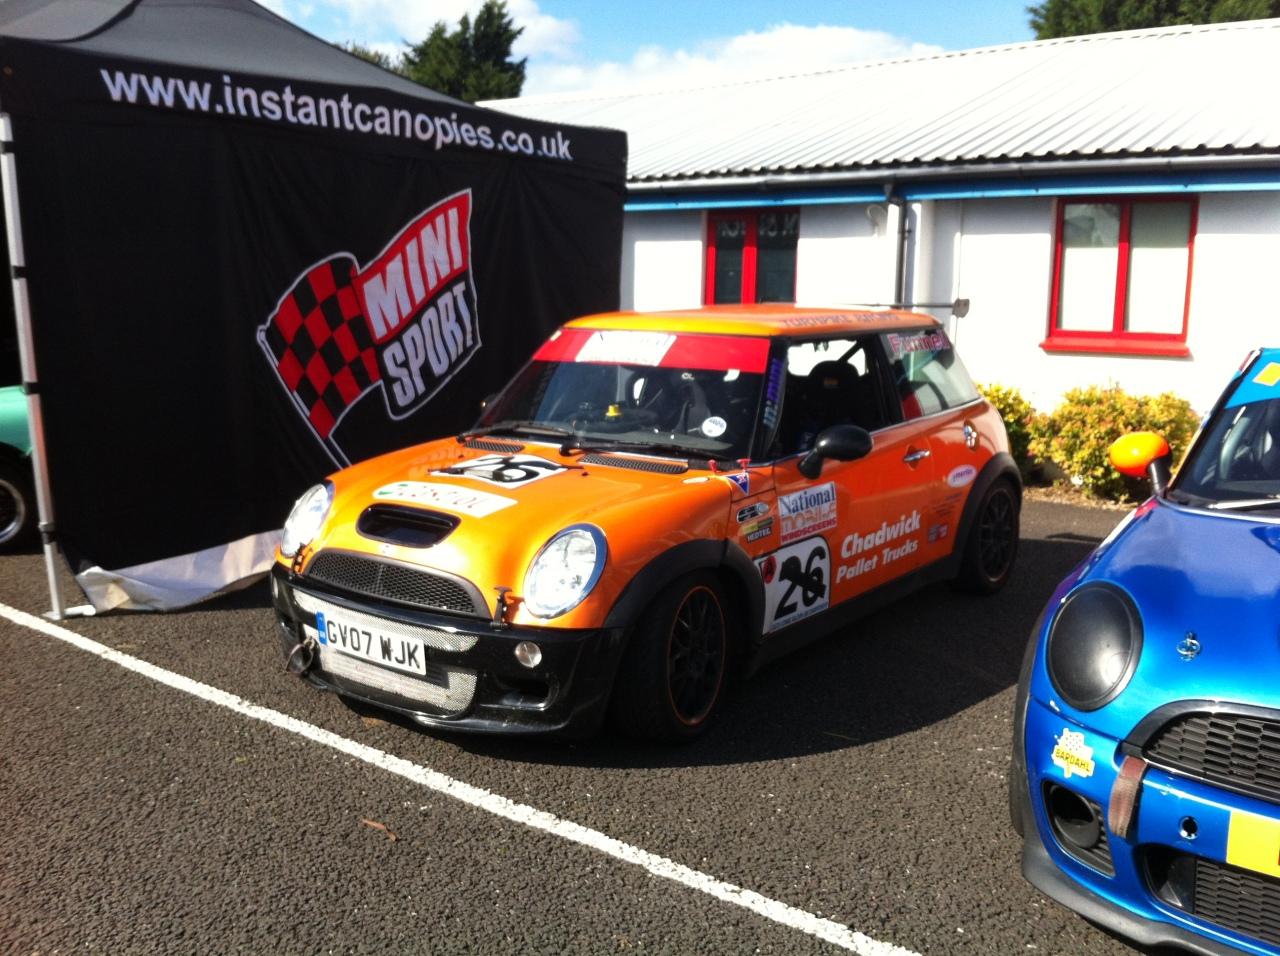 R53 Road Racer